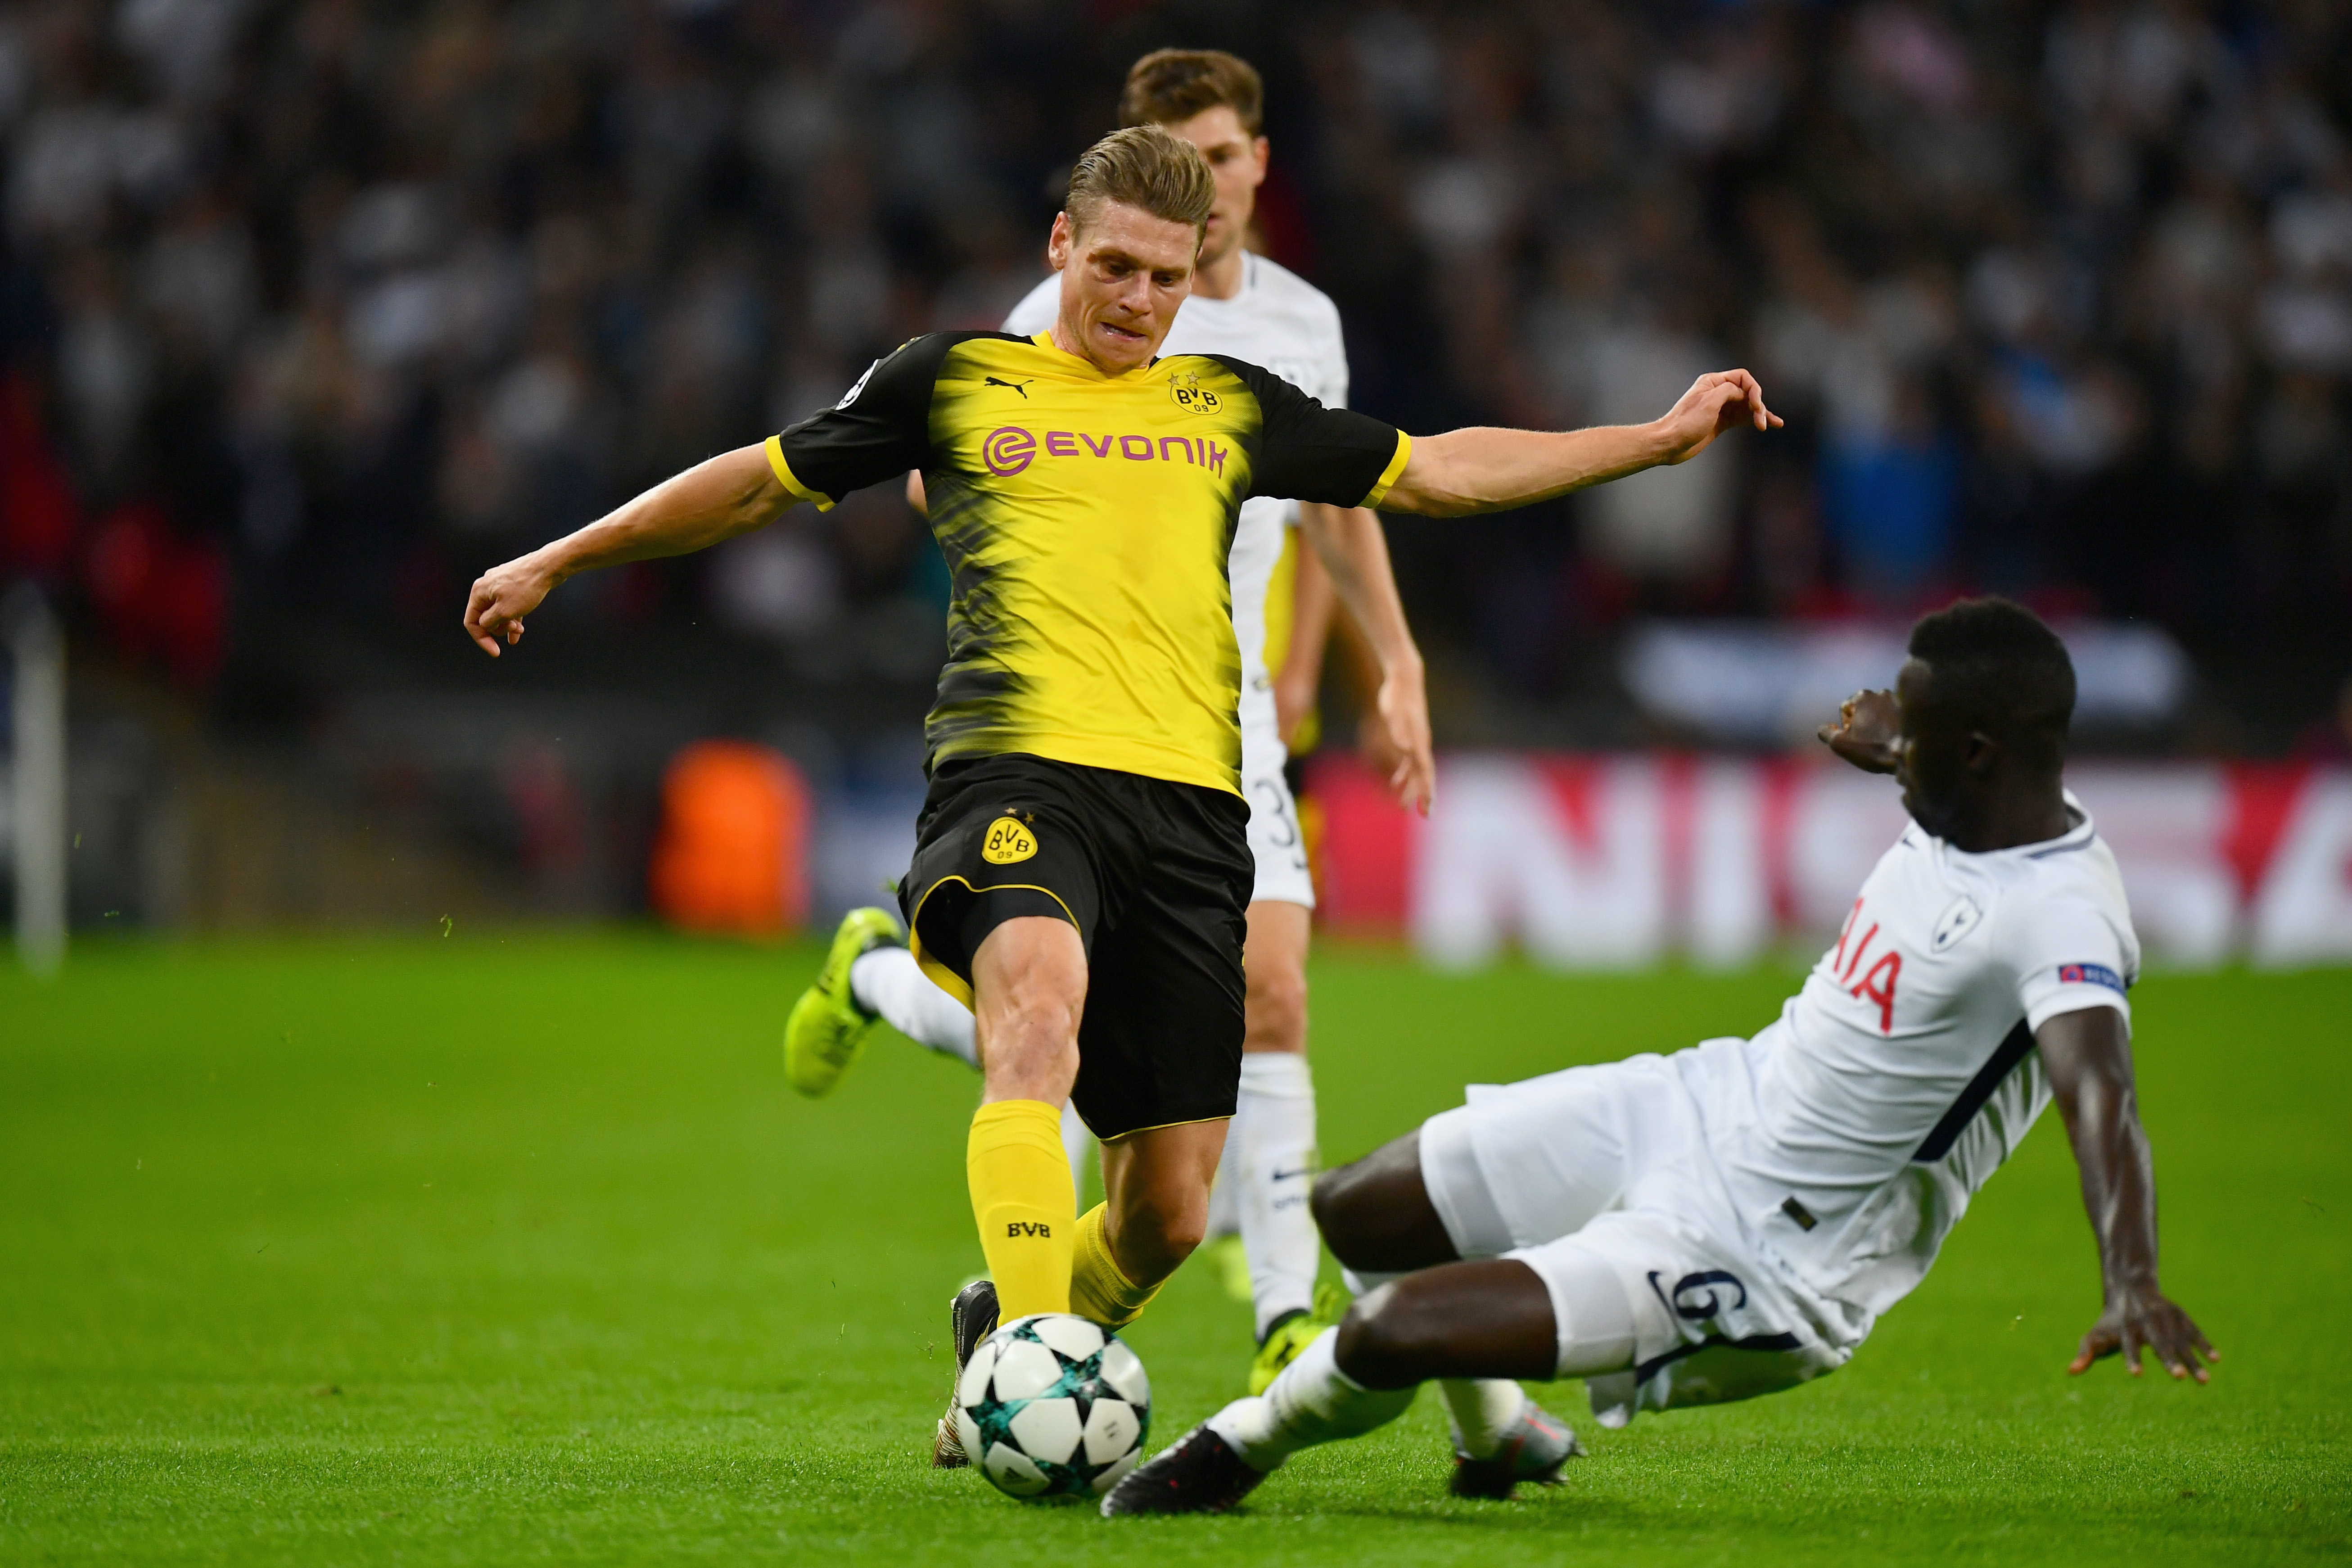 Davinson Sánchez Tottenham vs Borussia Dortmund Champions League